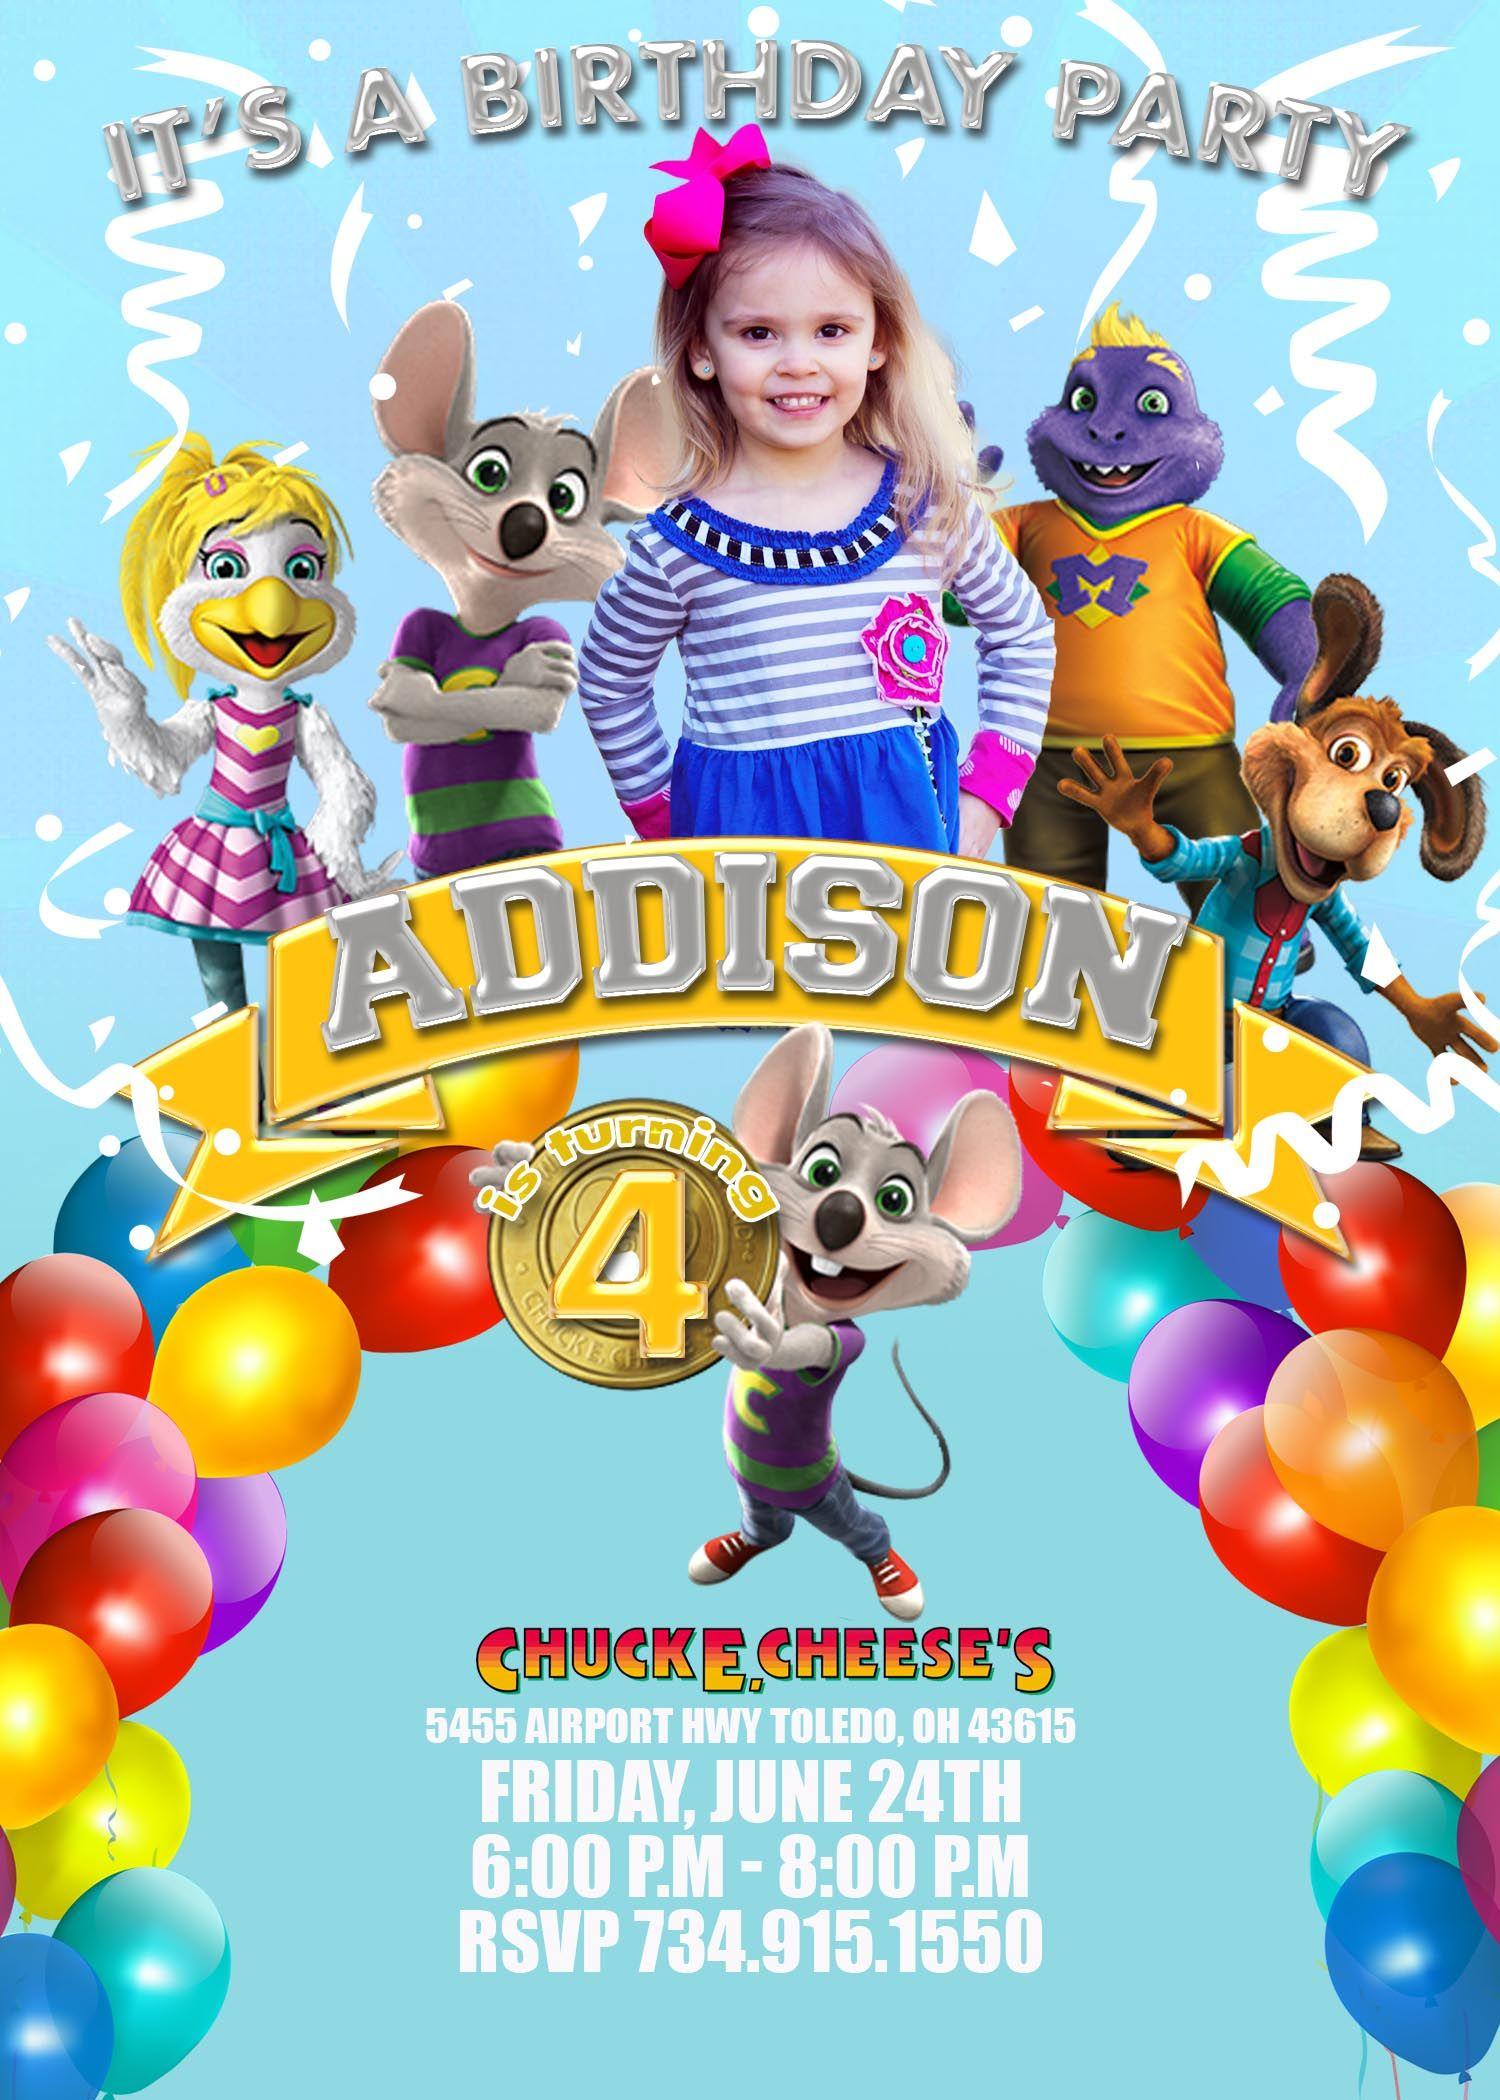 Chuck E Cheese Girl Birthday invitation